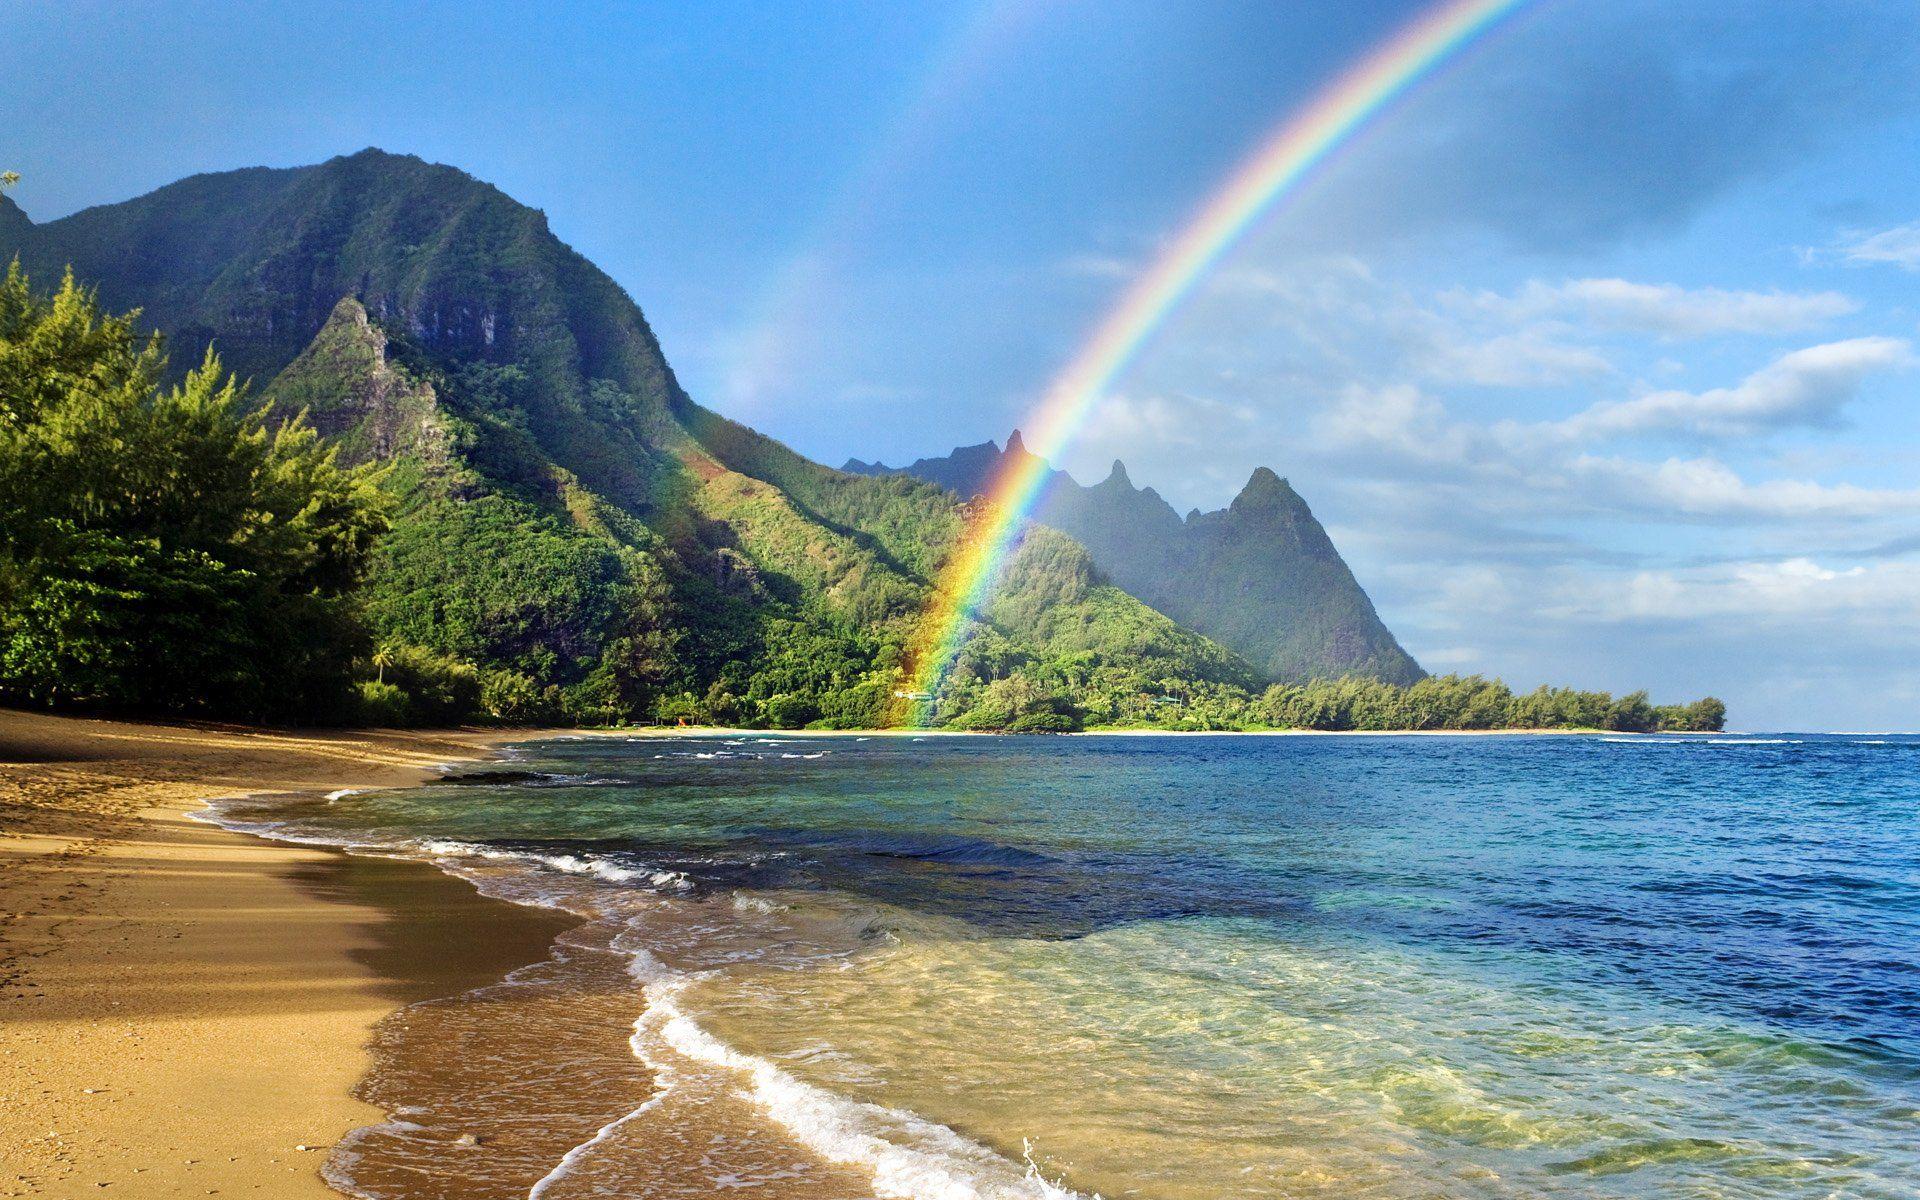 Hd wallpaper rainbow - Hd Wallpapers 1080p 1080p Hd Wallpapers On Sea And Rainbow Hd Wallpaper 1080p 1080